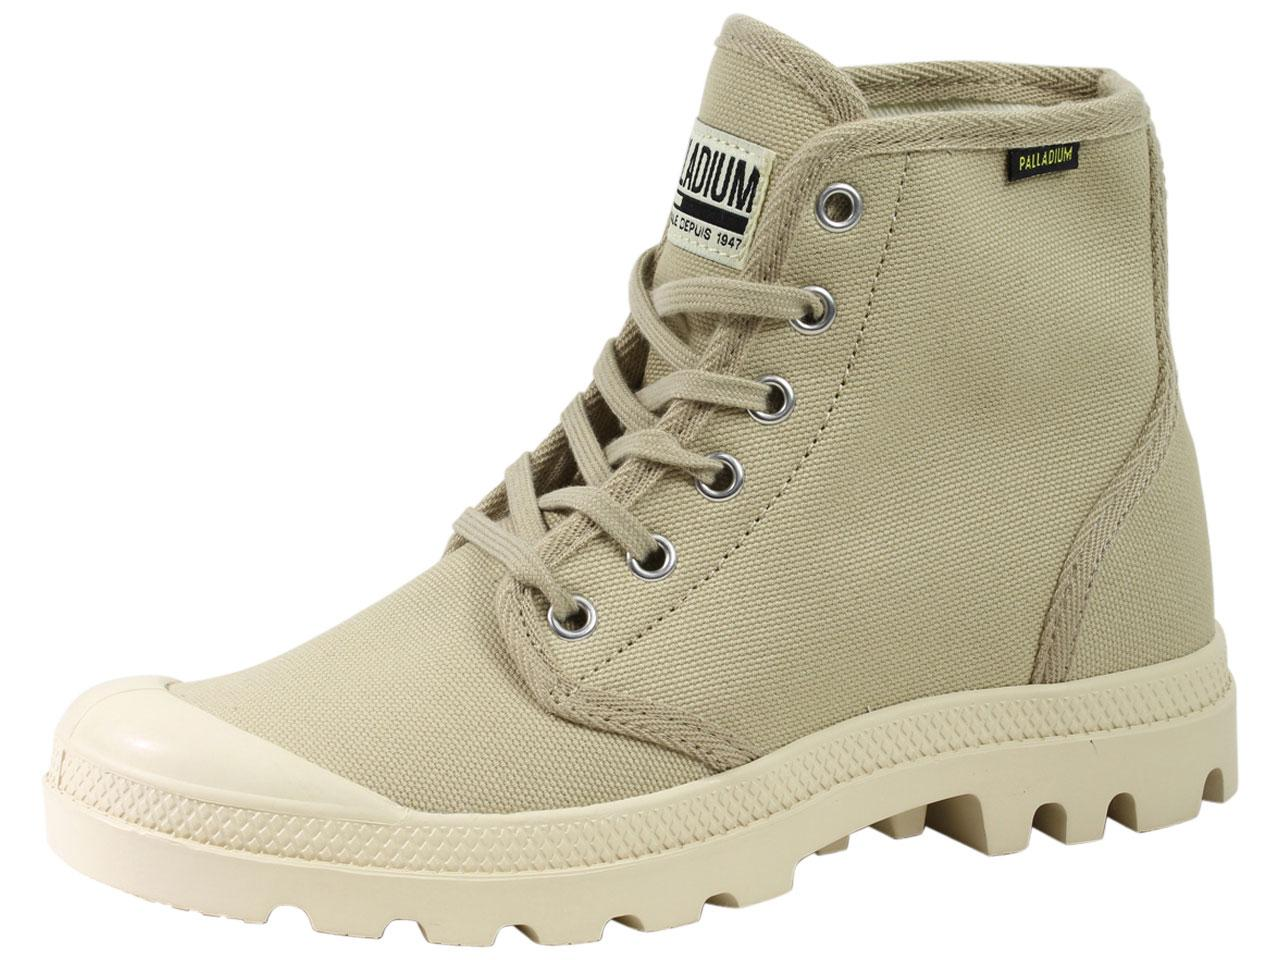 Image of Palladium Men's Pampa Hi Originale Chukka Boots Shoes - Beige - 12 D(M) US/13.5 B(M) US